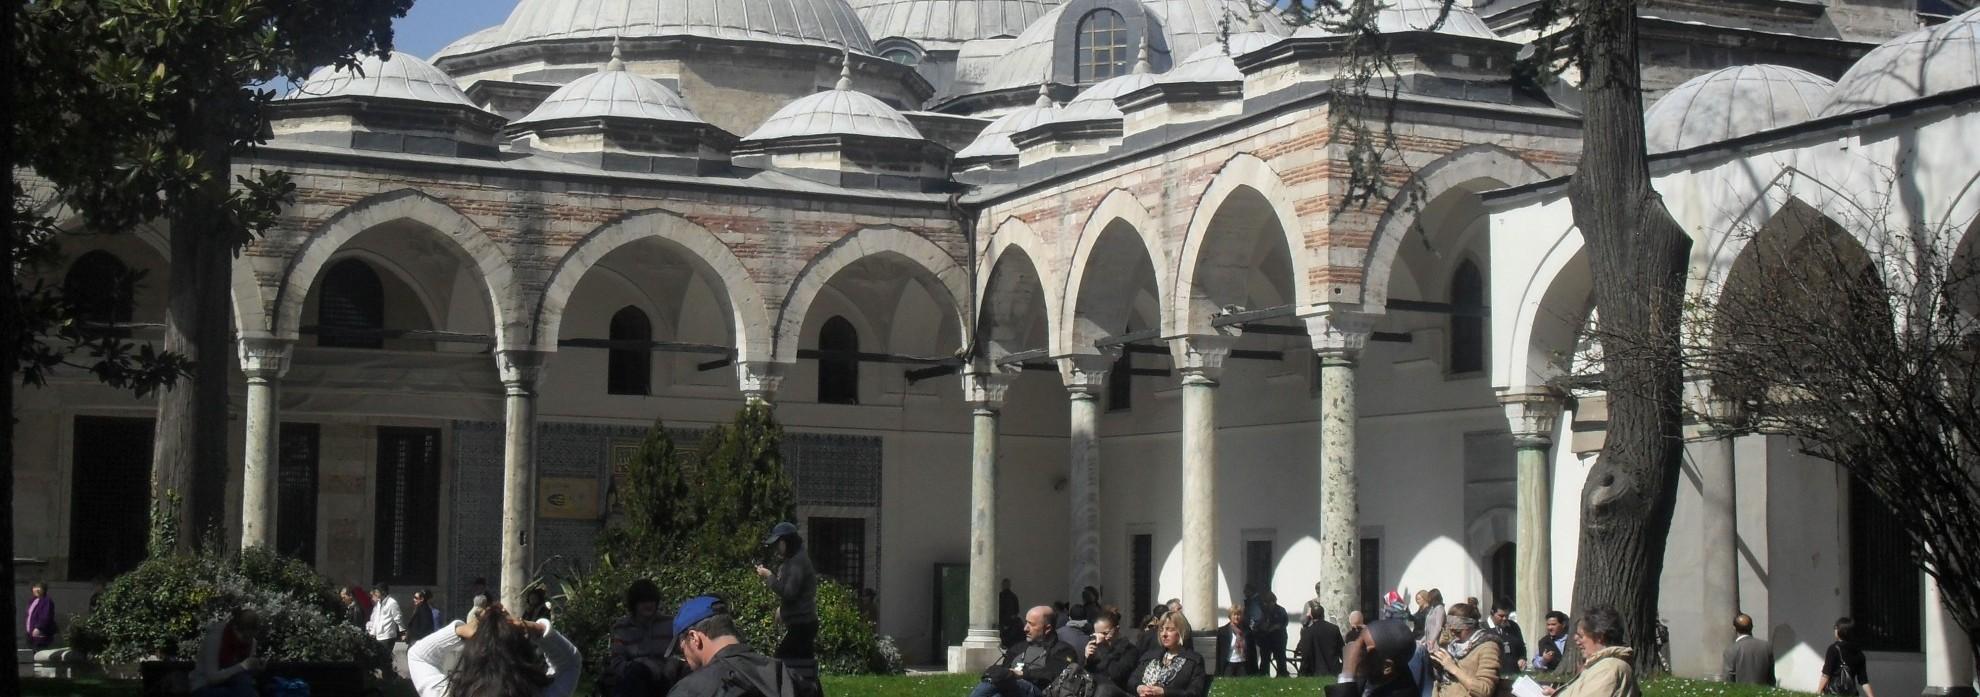 topkapi-palace-istanbul-8-e1412160578177